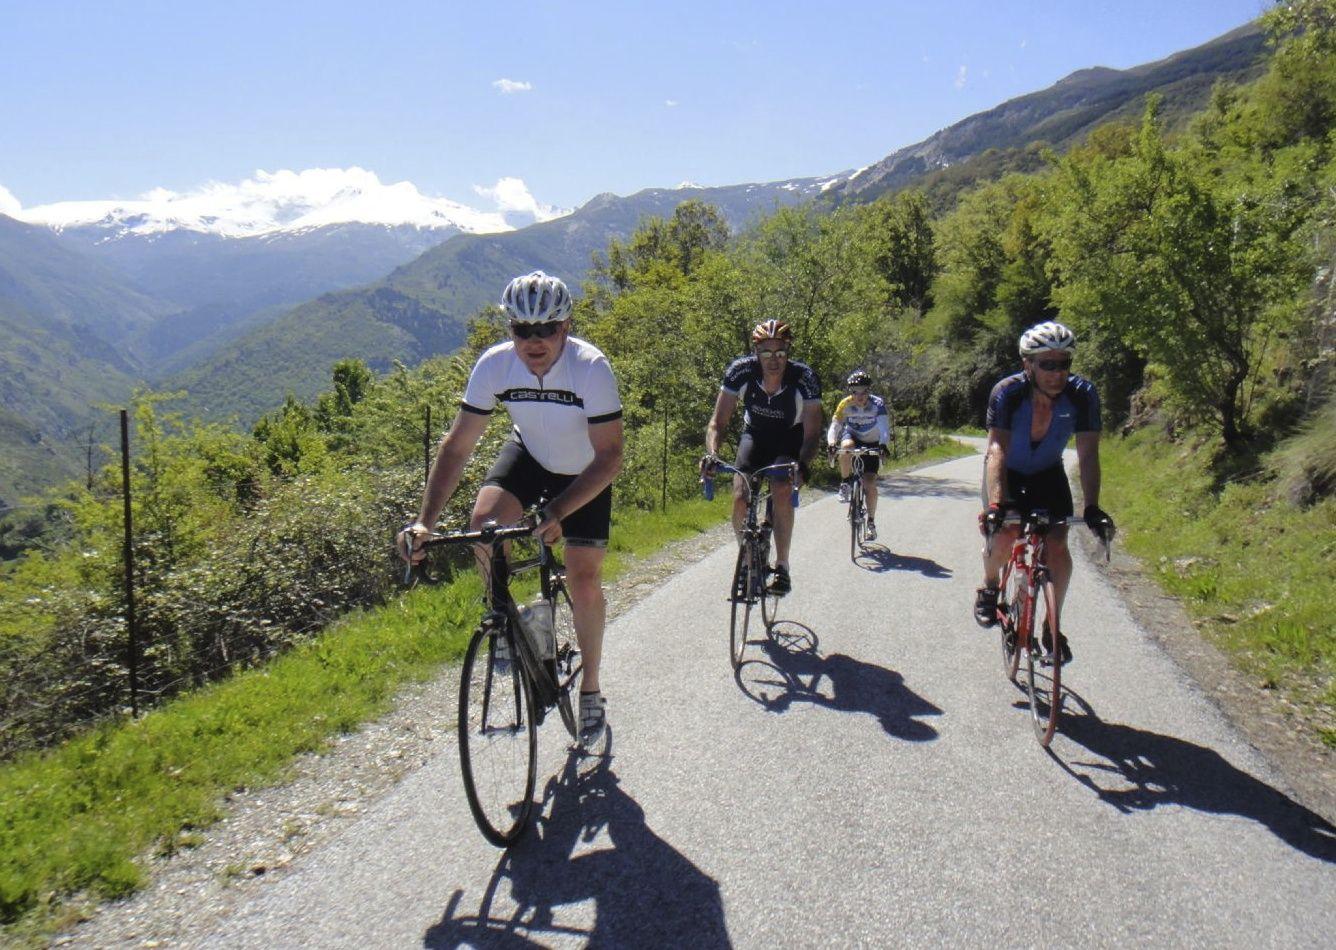 _Holiday.382.4624_full.jpg - Southern Spain - Sierra Nevada and Granada - Guided Road Cycling Holiday - Road Cycling